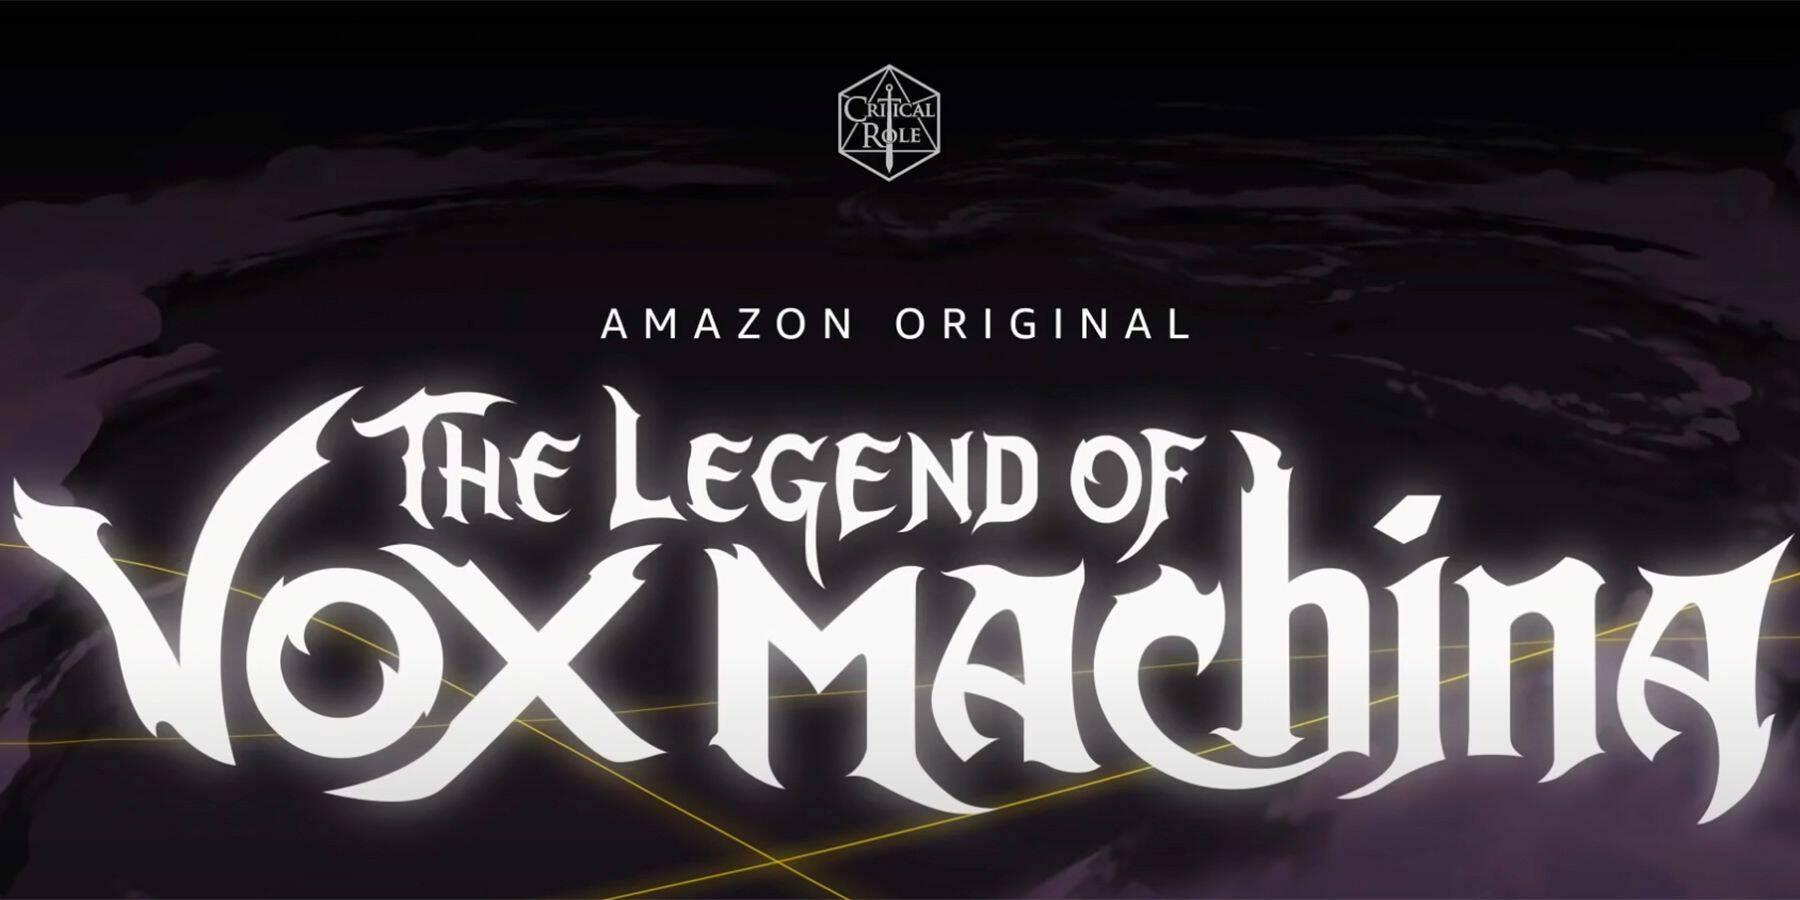 the legend of vox machina